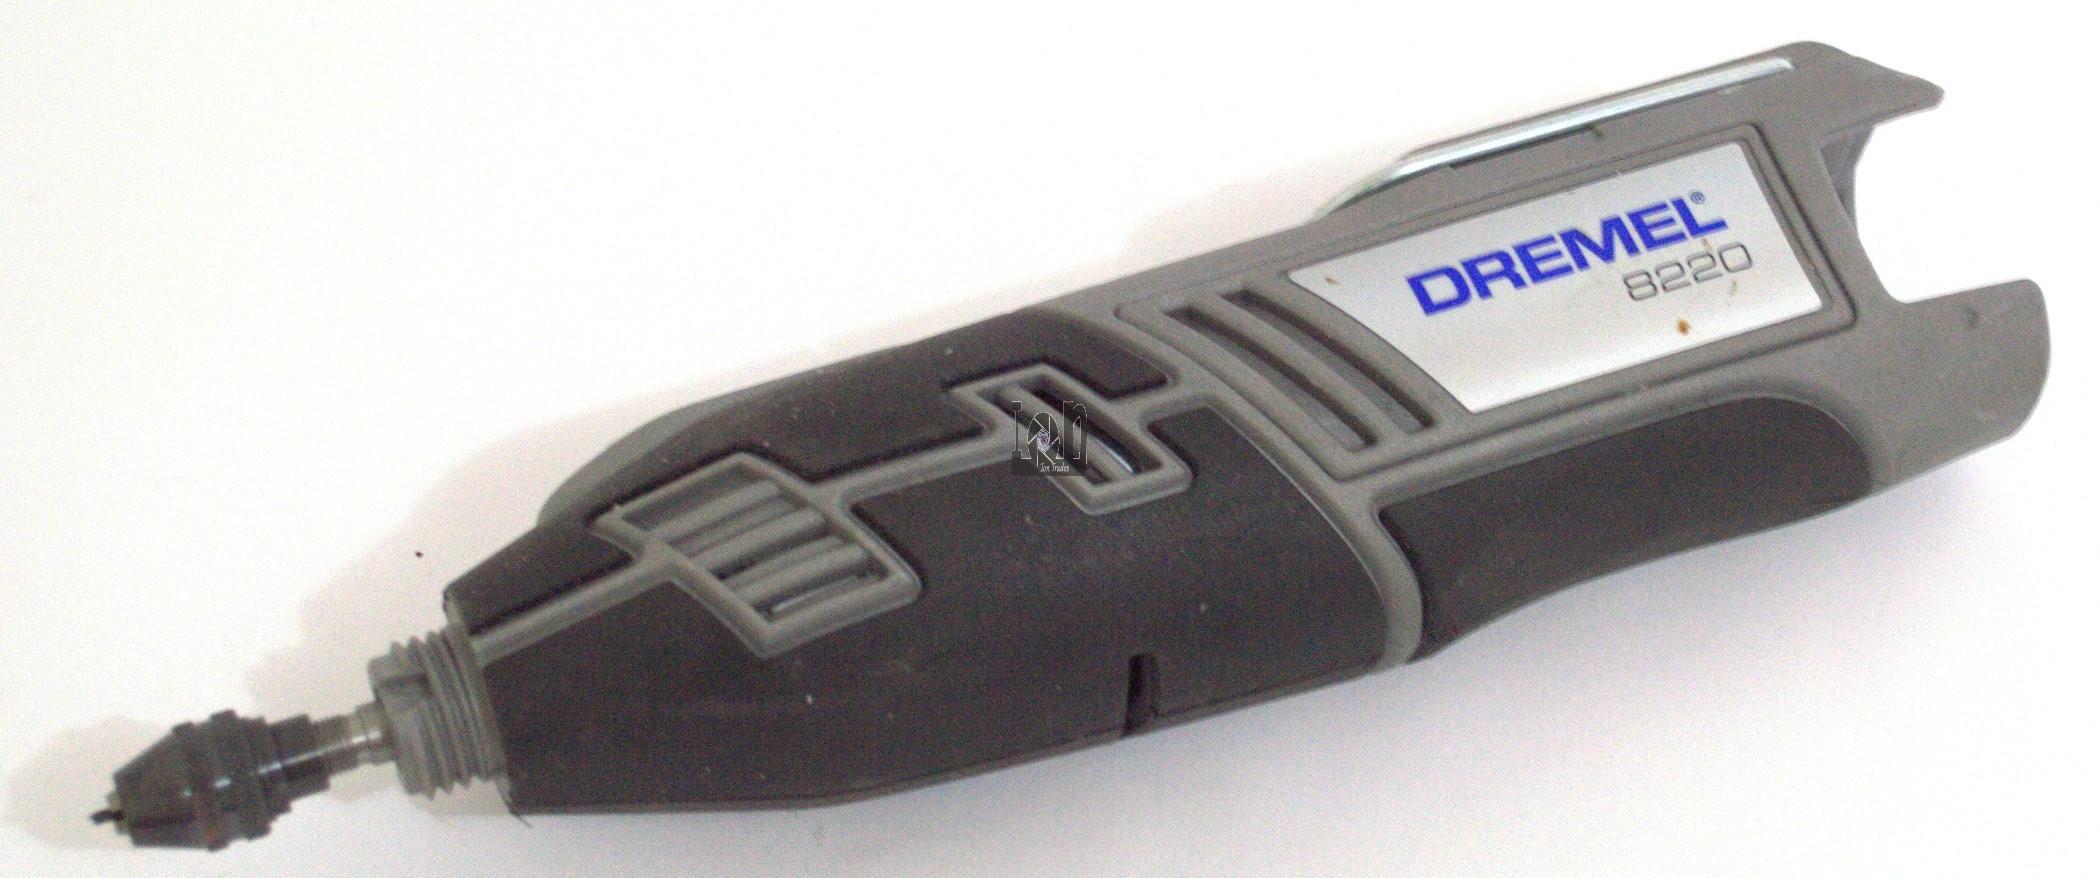 Dremel Tool 12V Rotary Tool 8220 Bare Tool Only Cordless